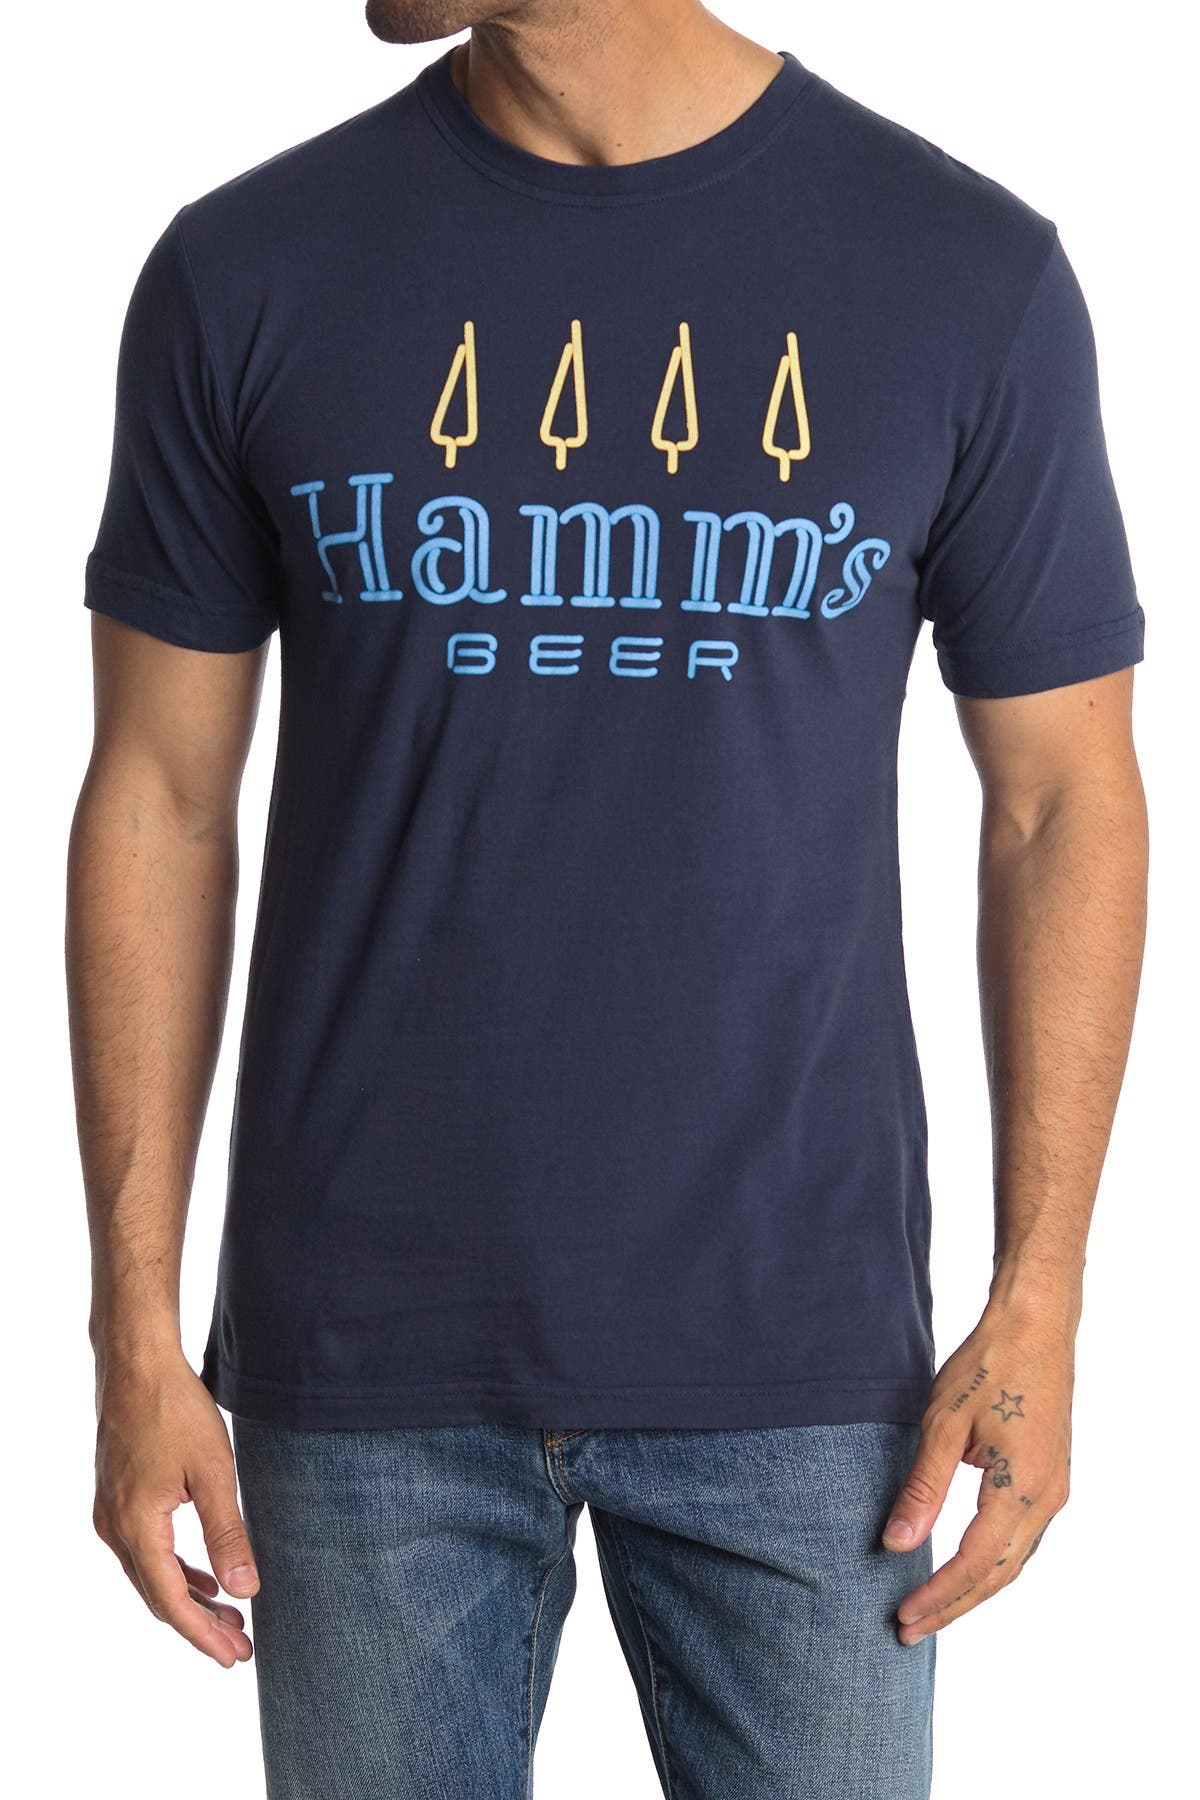 Image of American Needle Hamm's Beer Graphic Crew Neck T-Shirt